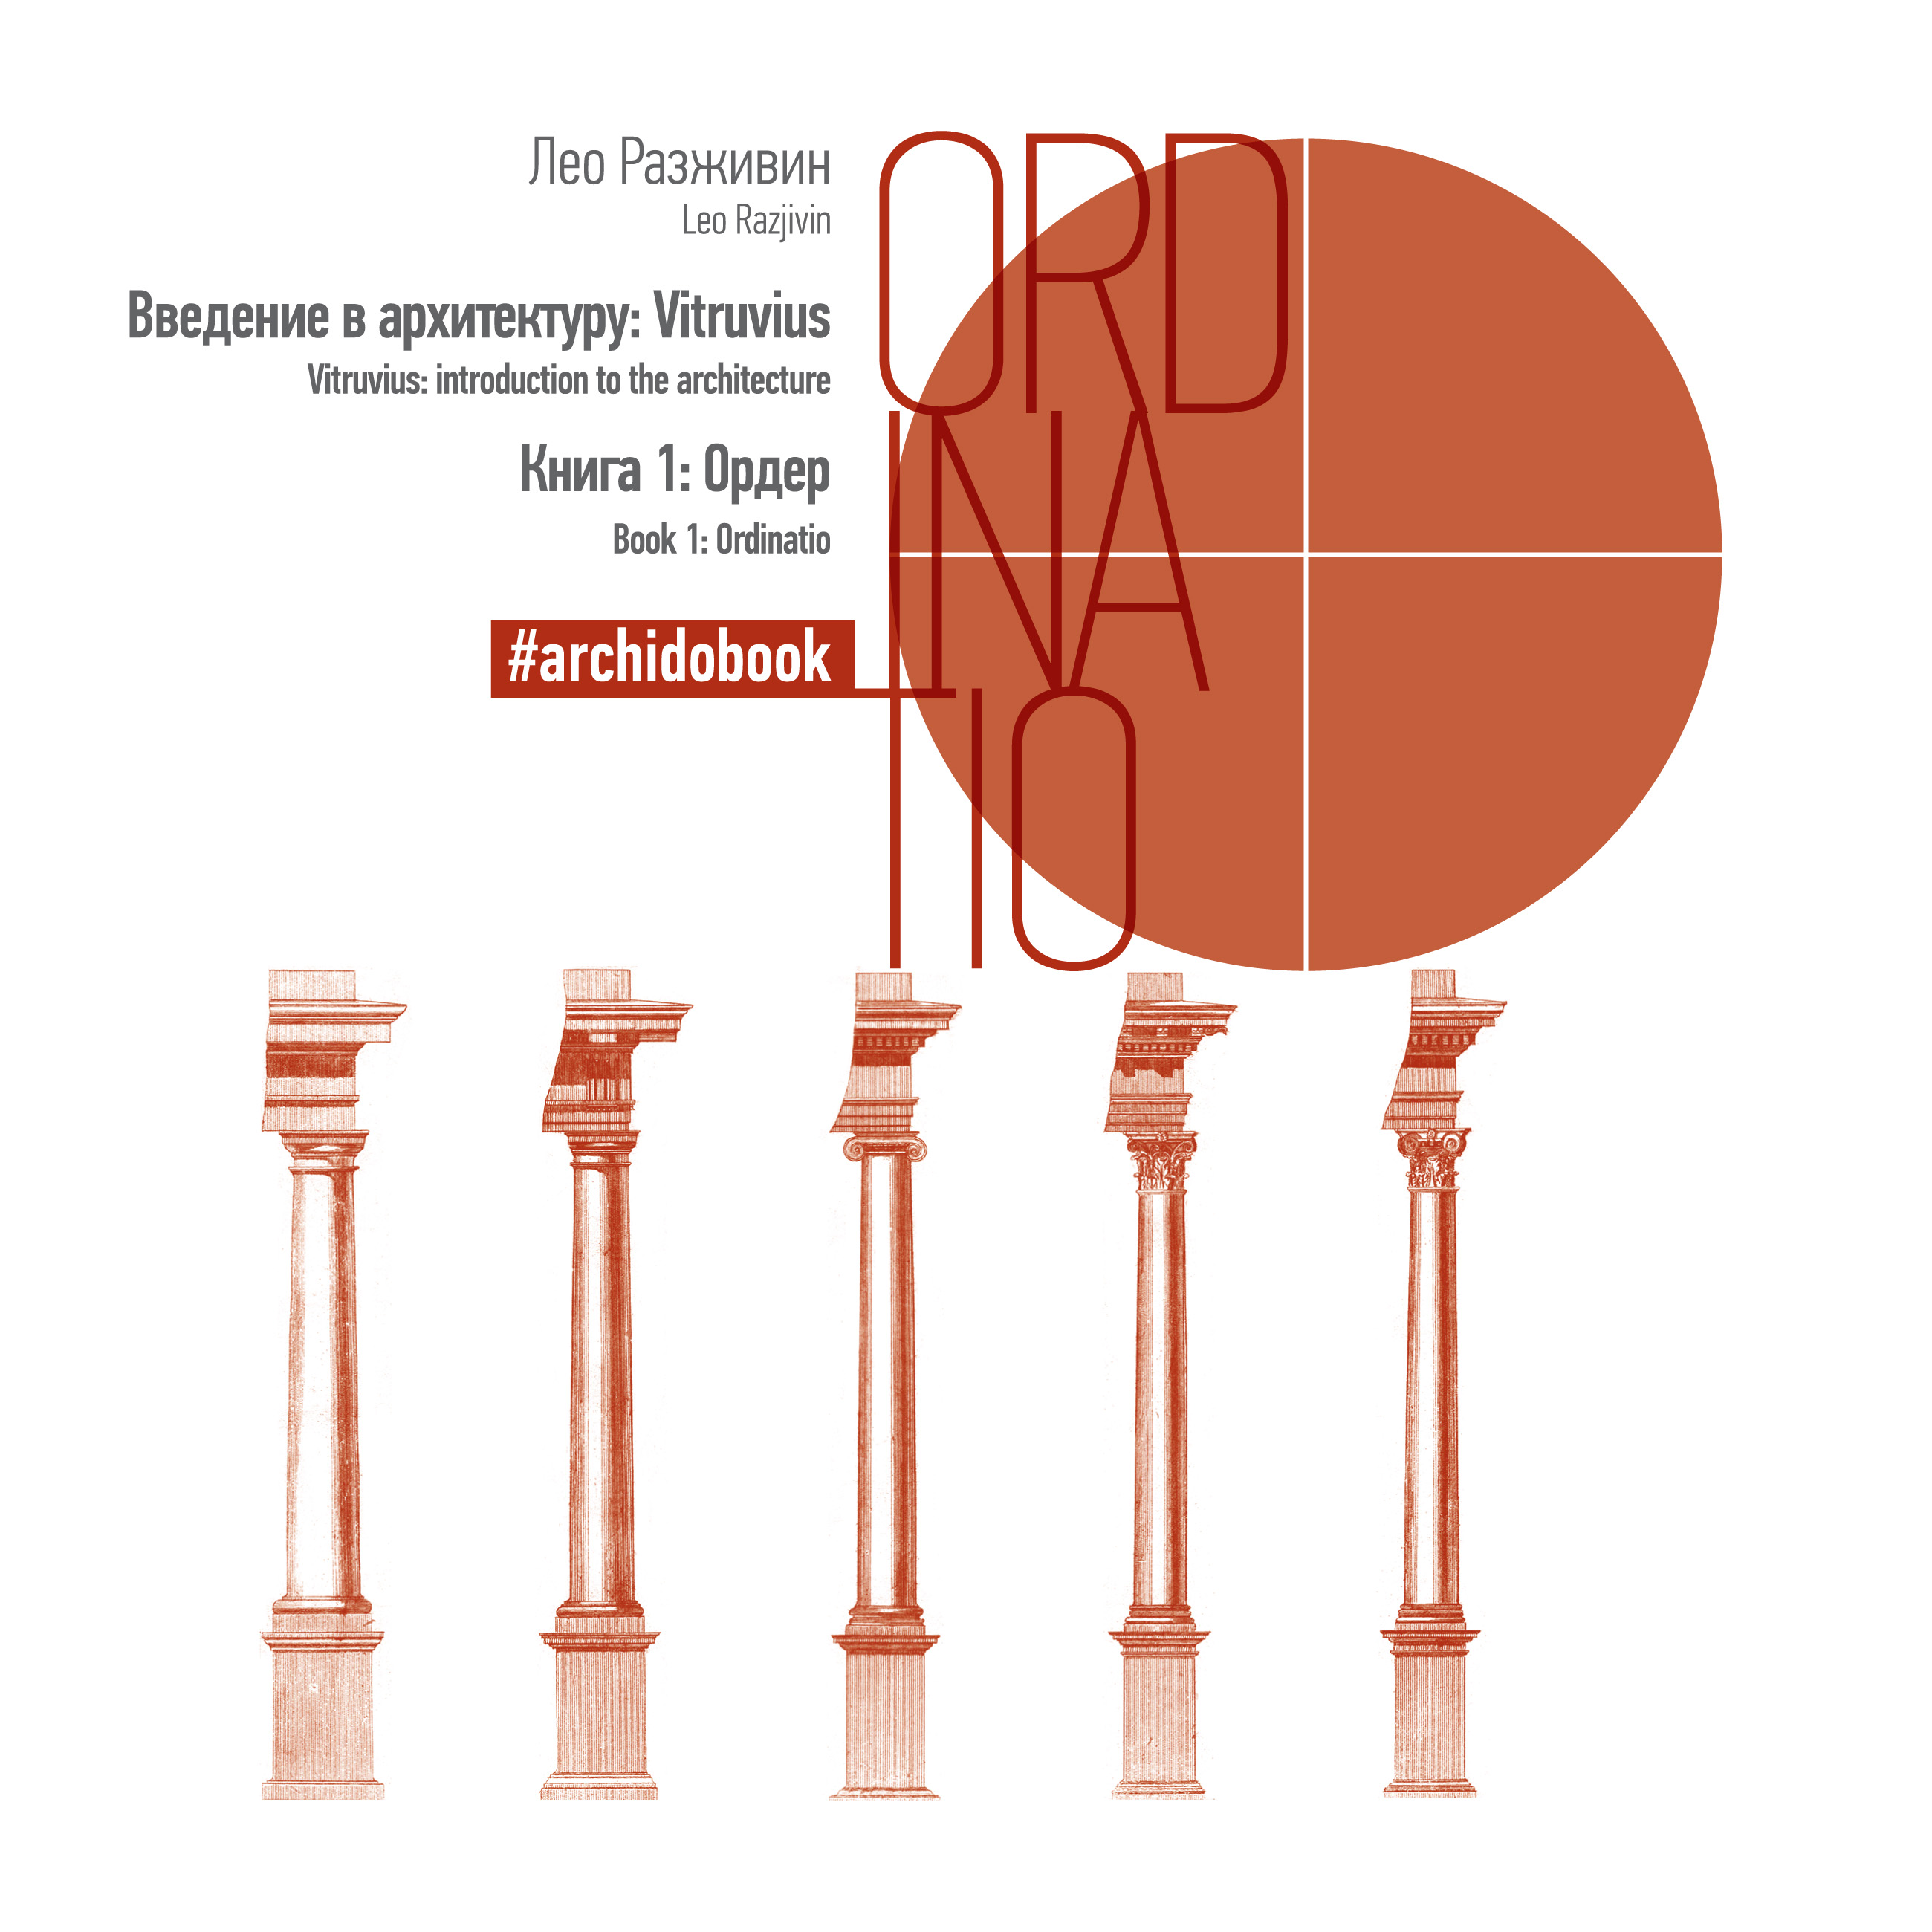 Введение в архитектуру: Vitruvius. Книга 1: Ордер